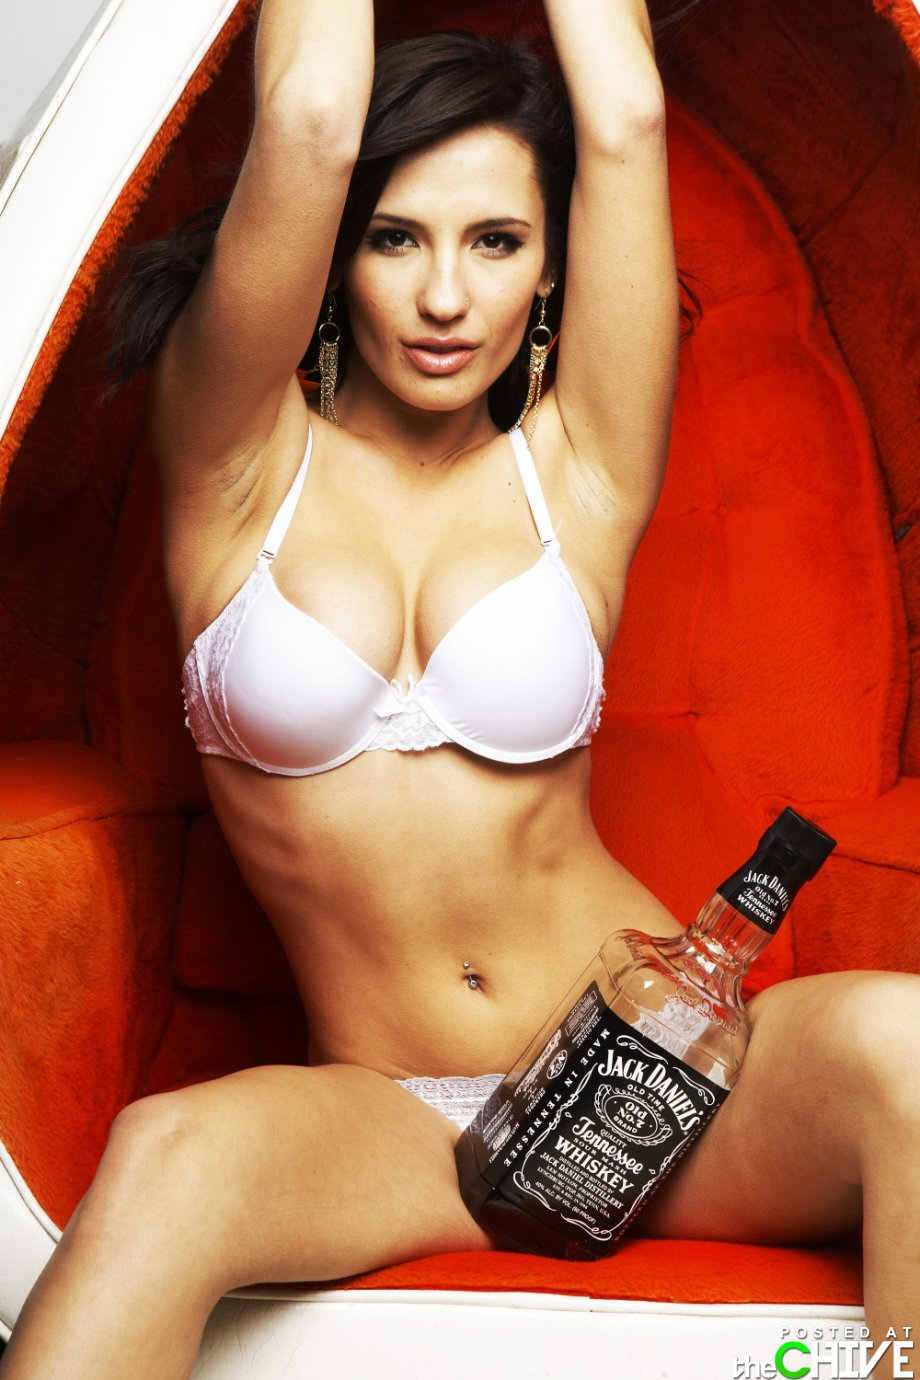 Topless Hot Shay Maria naked photo 2017